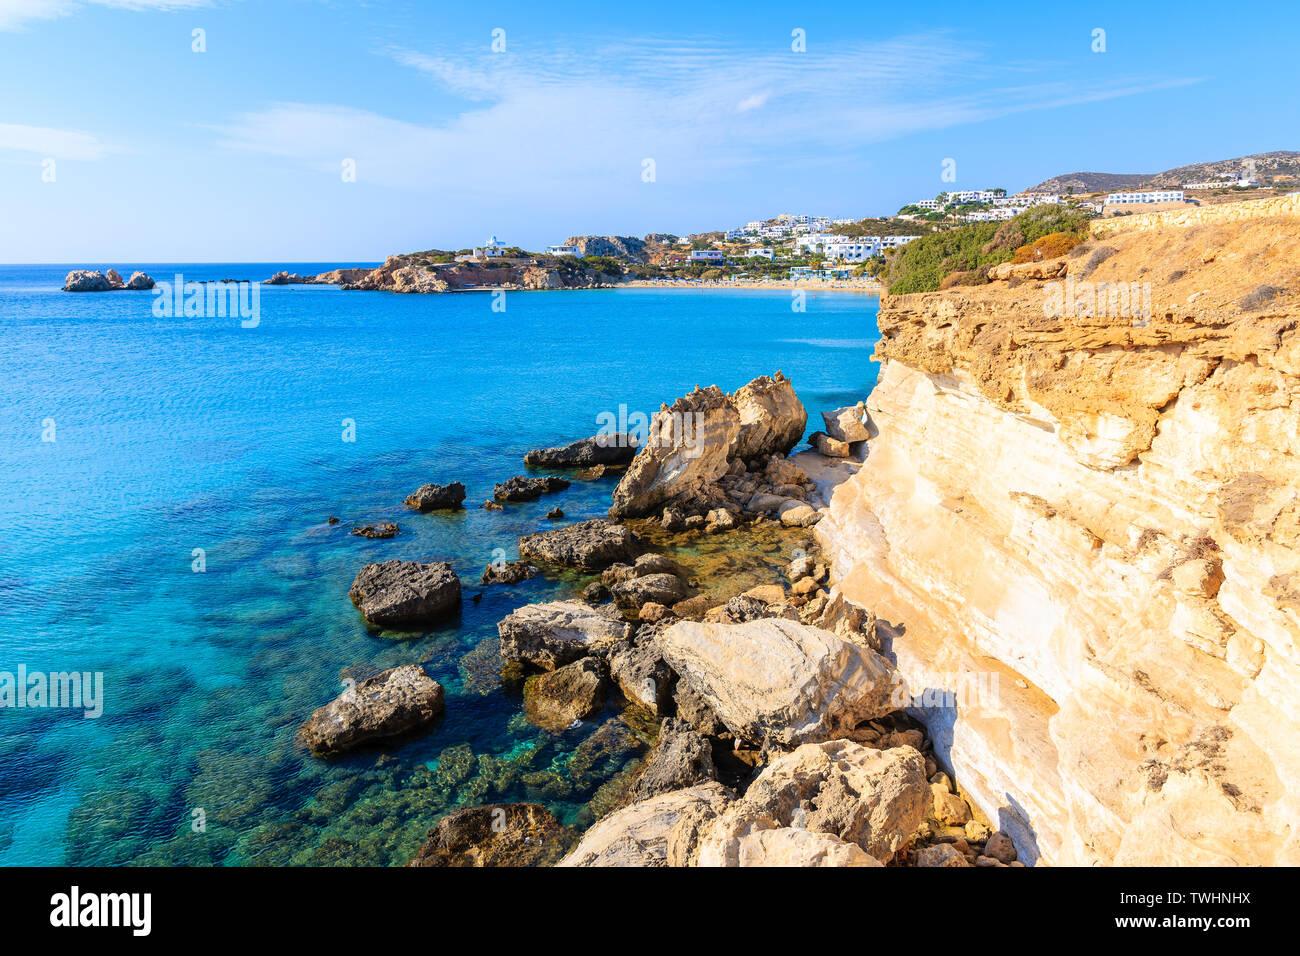 Rocks and azure sea in beautiful bay on Karpathos island in Ammopi village, Greece Stock Photo